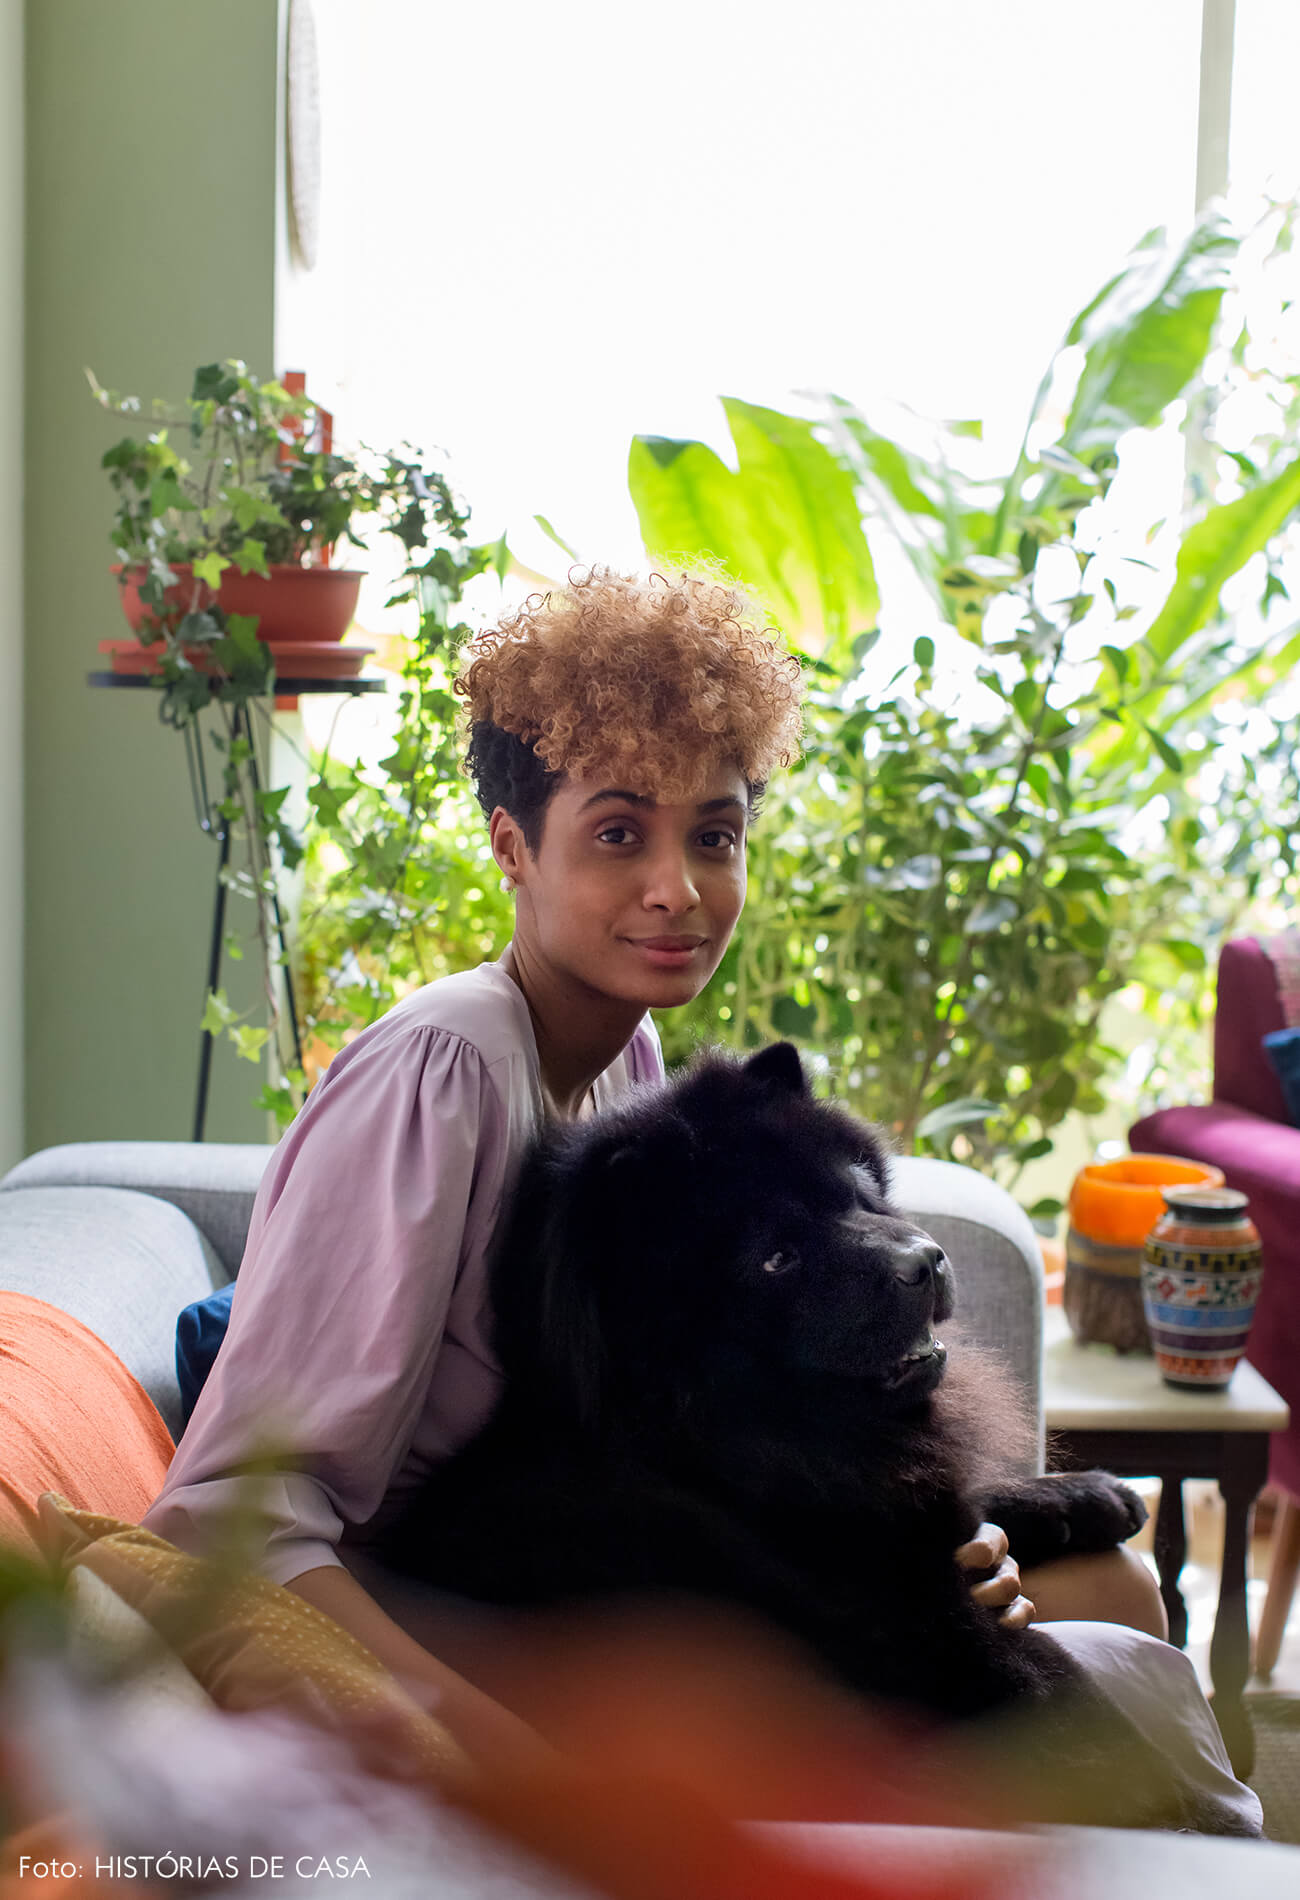 retrato-pet-cachorro-parede-verde-plantas